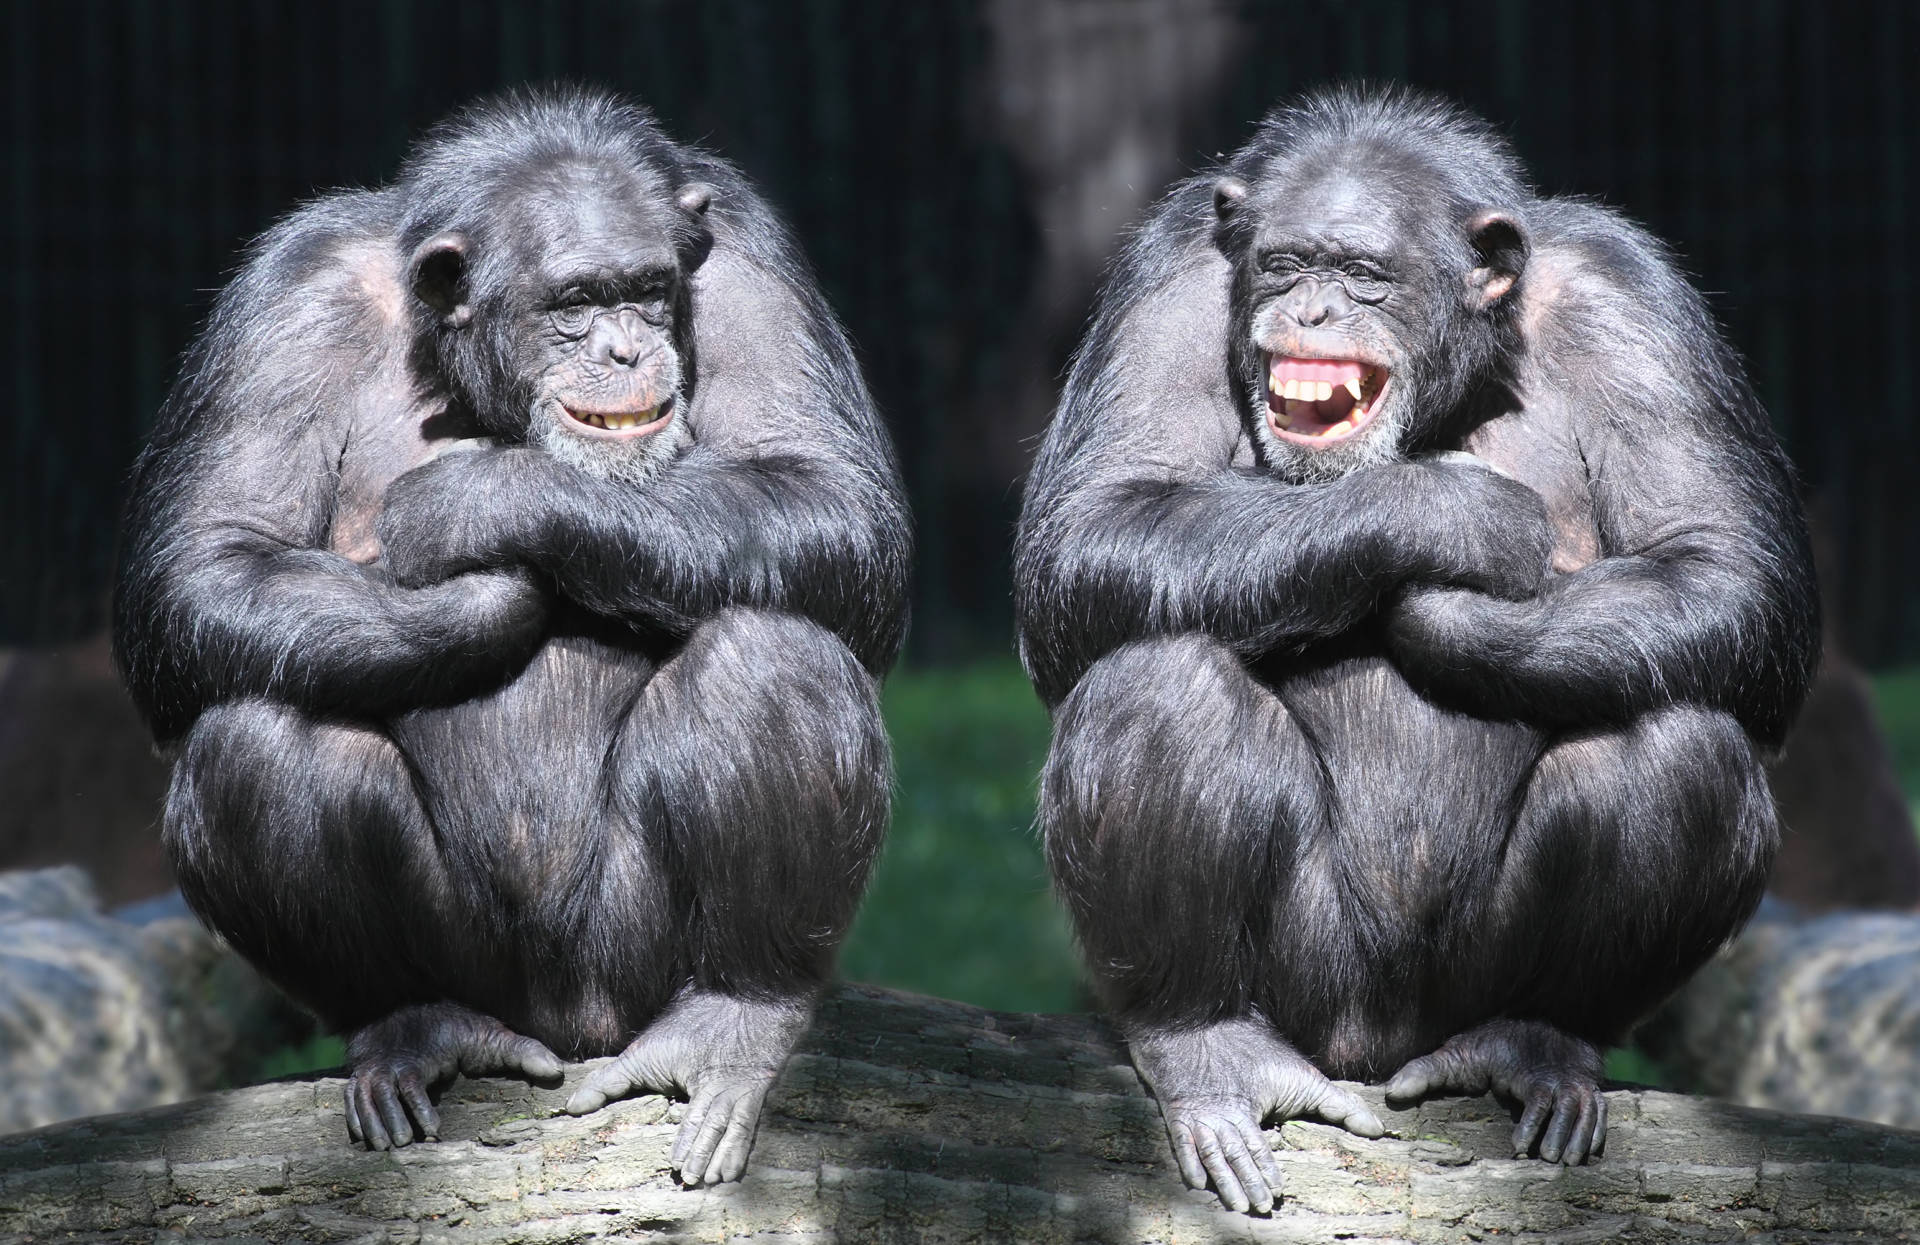 Two chimpanzees. iStock